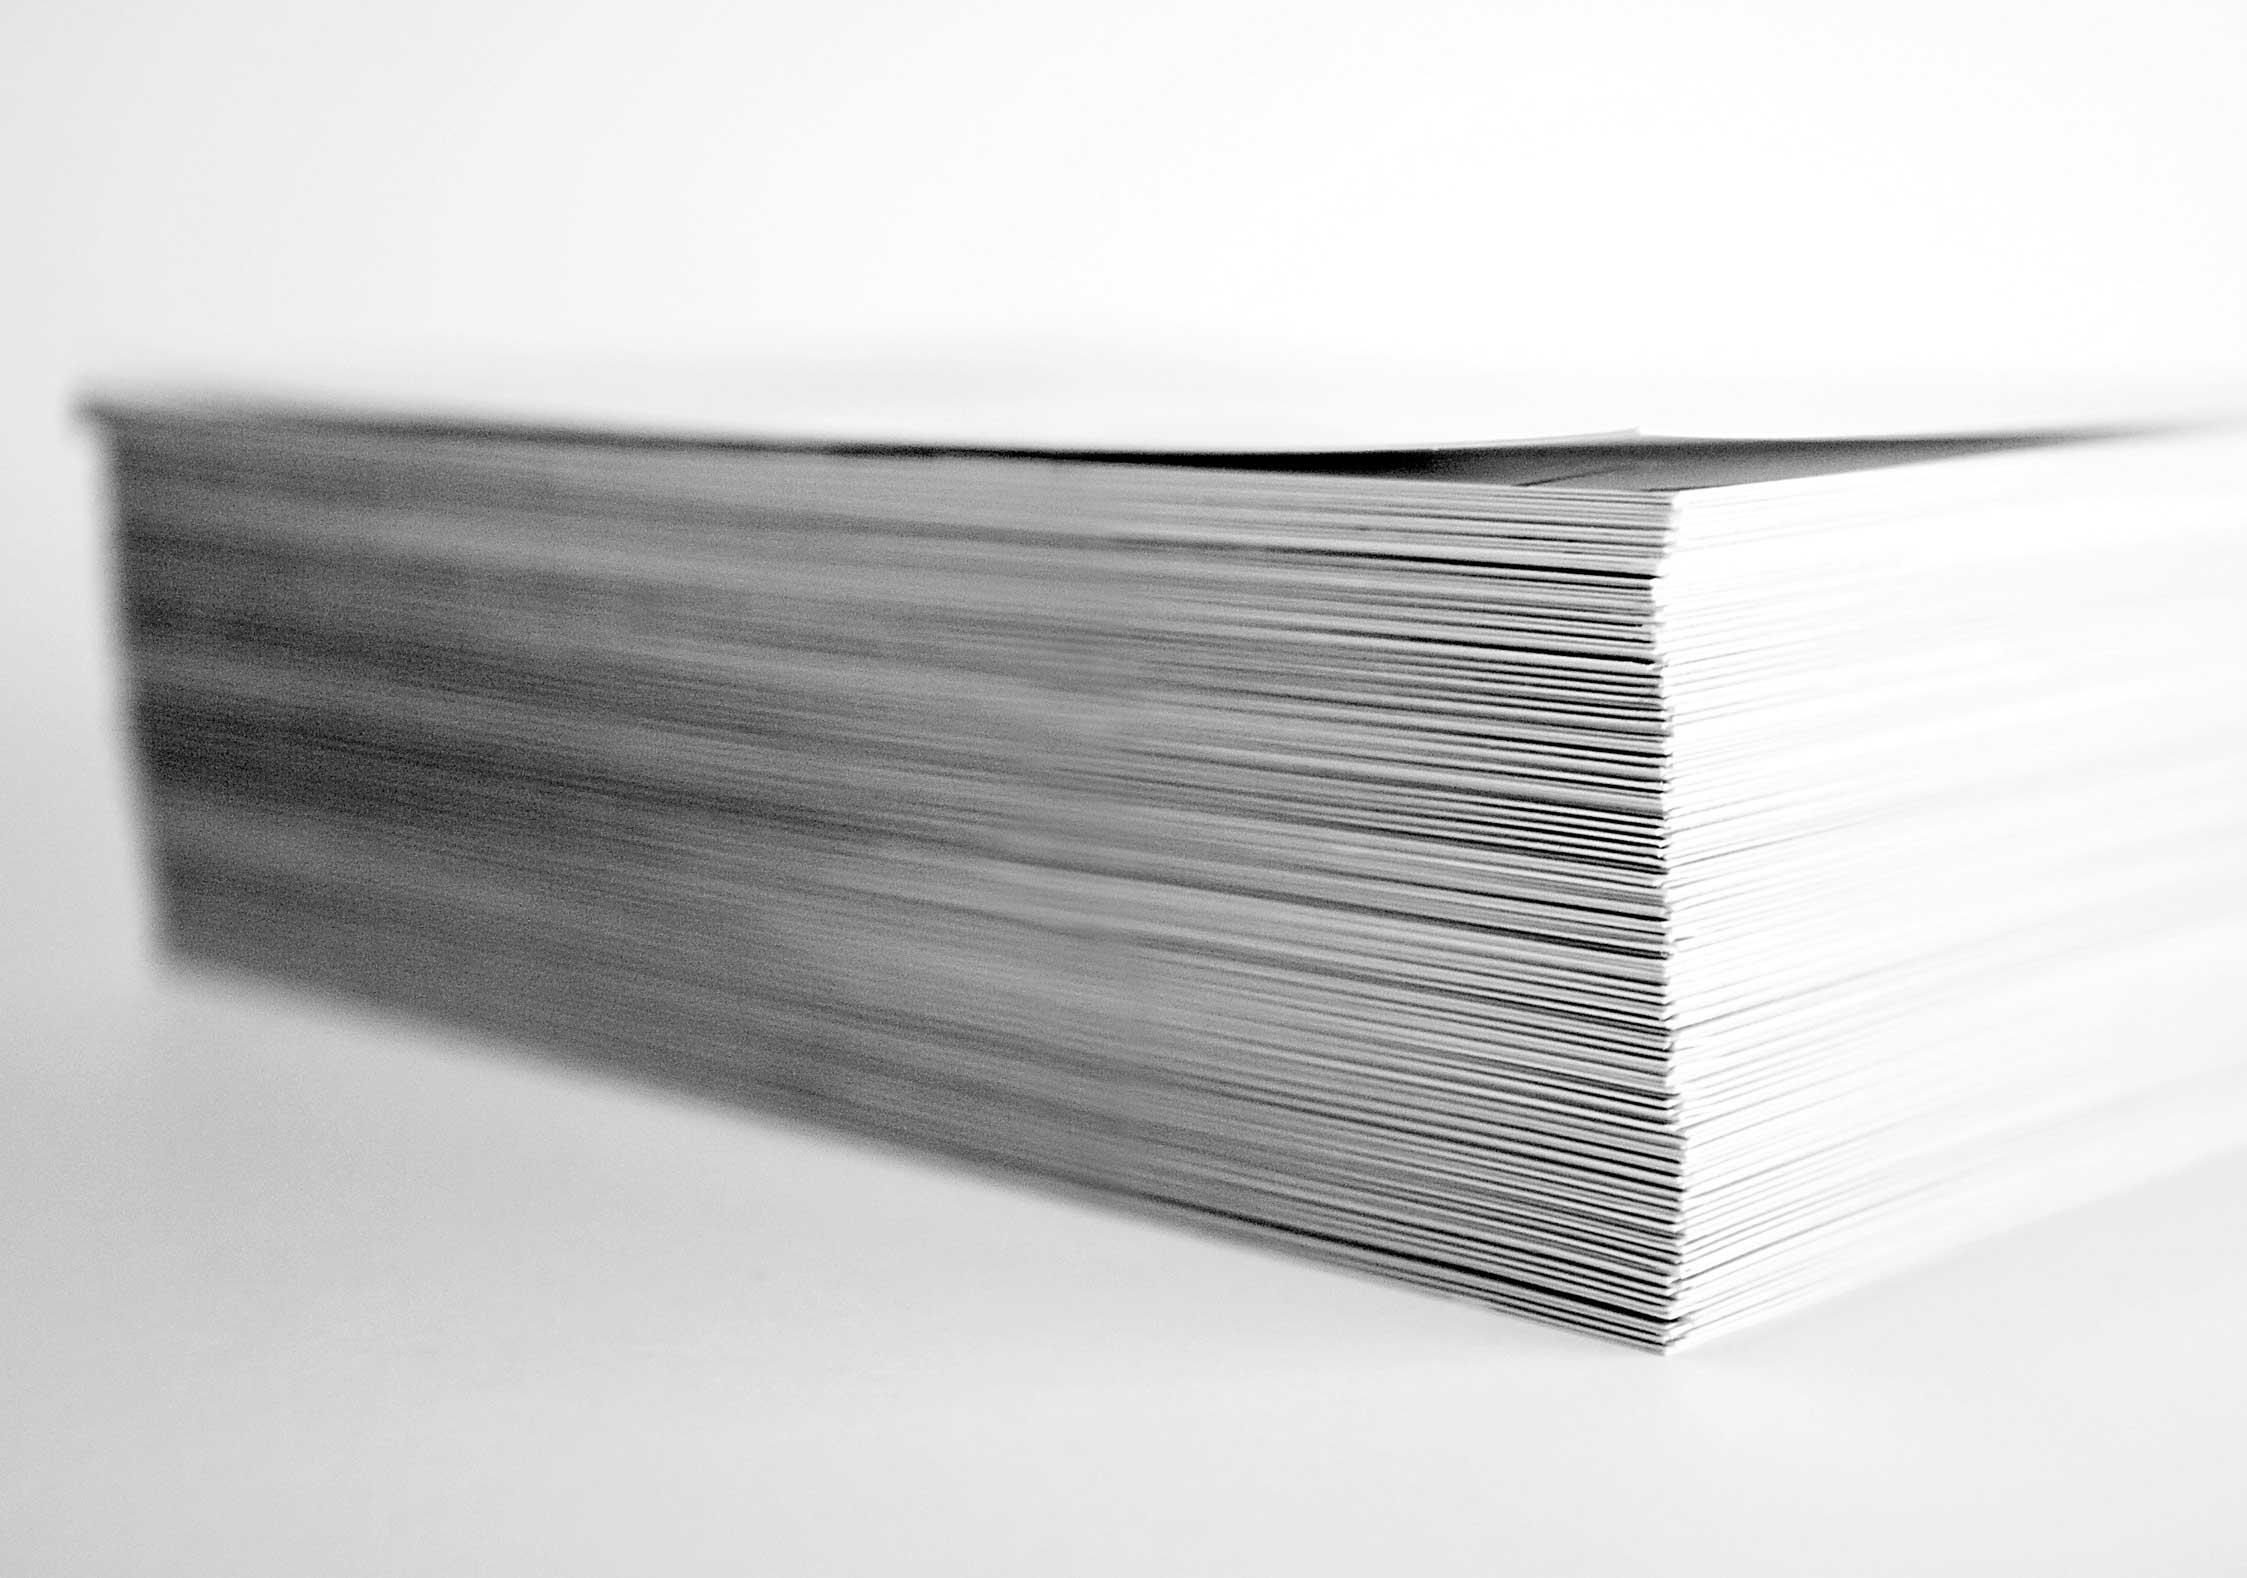 The hidden benefits of document scanning